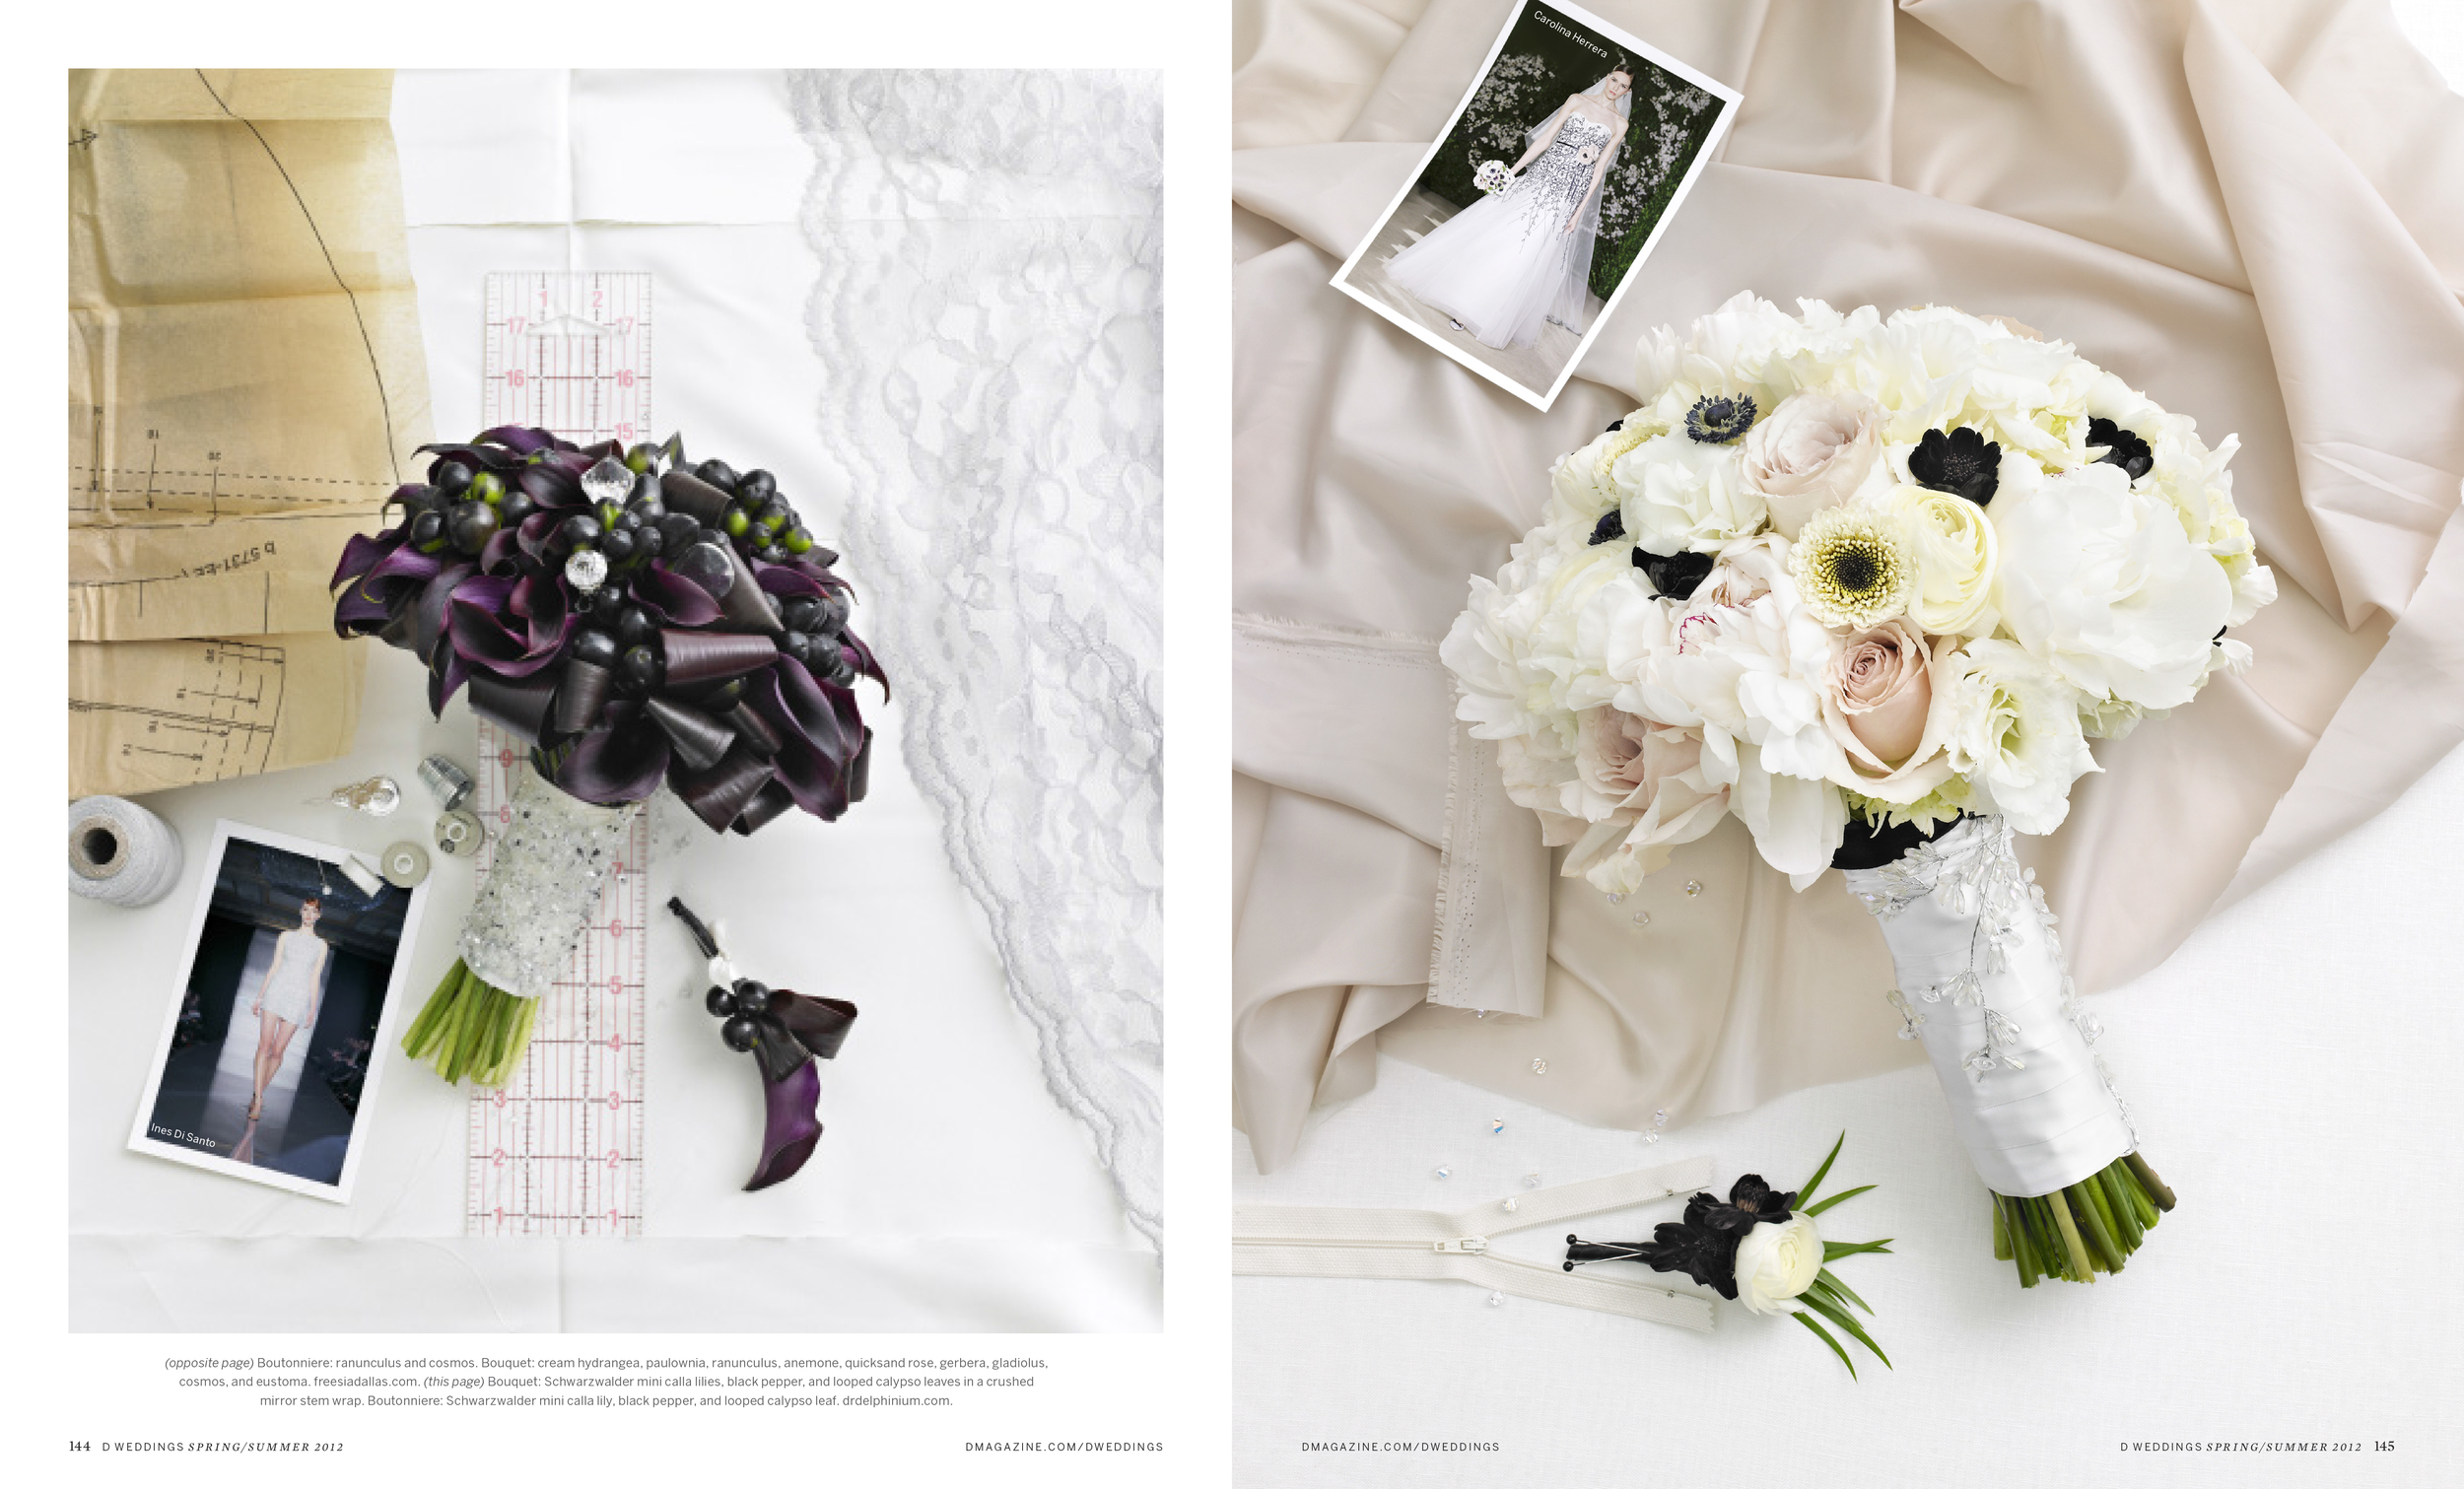 JamieLaubhanOliver_spread_bouquetfashion2.jpg